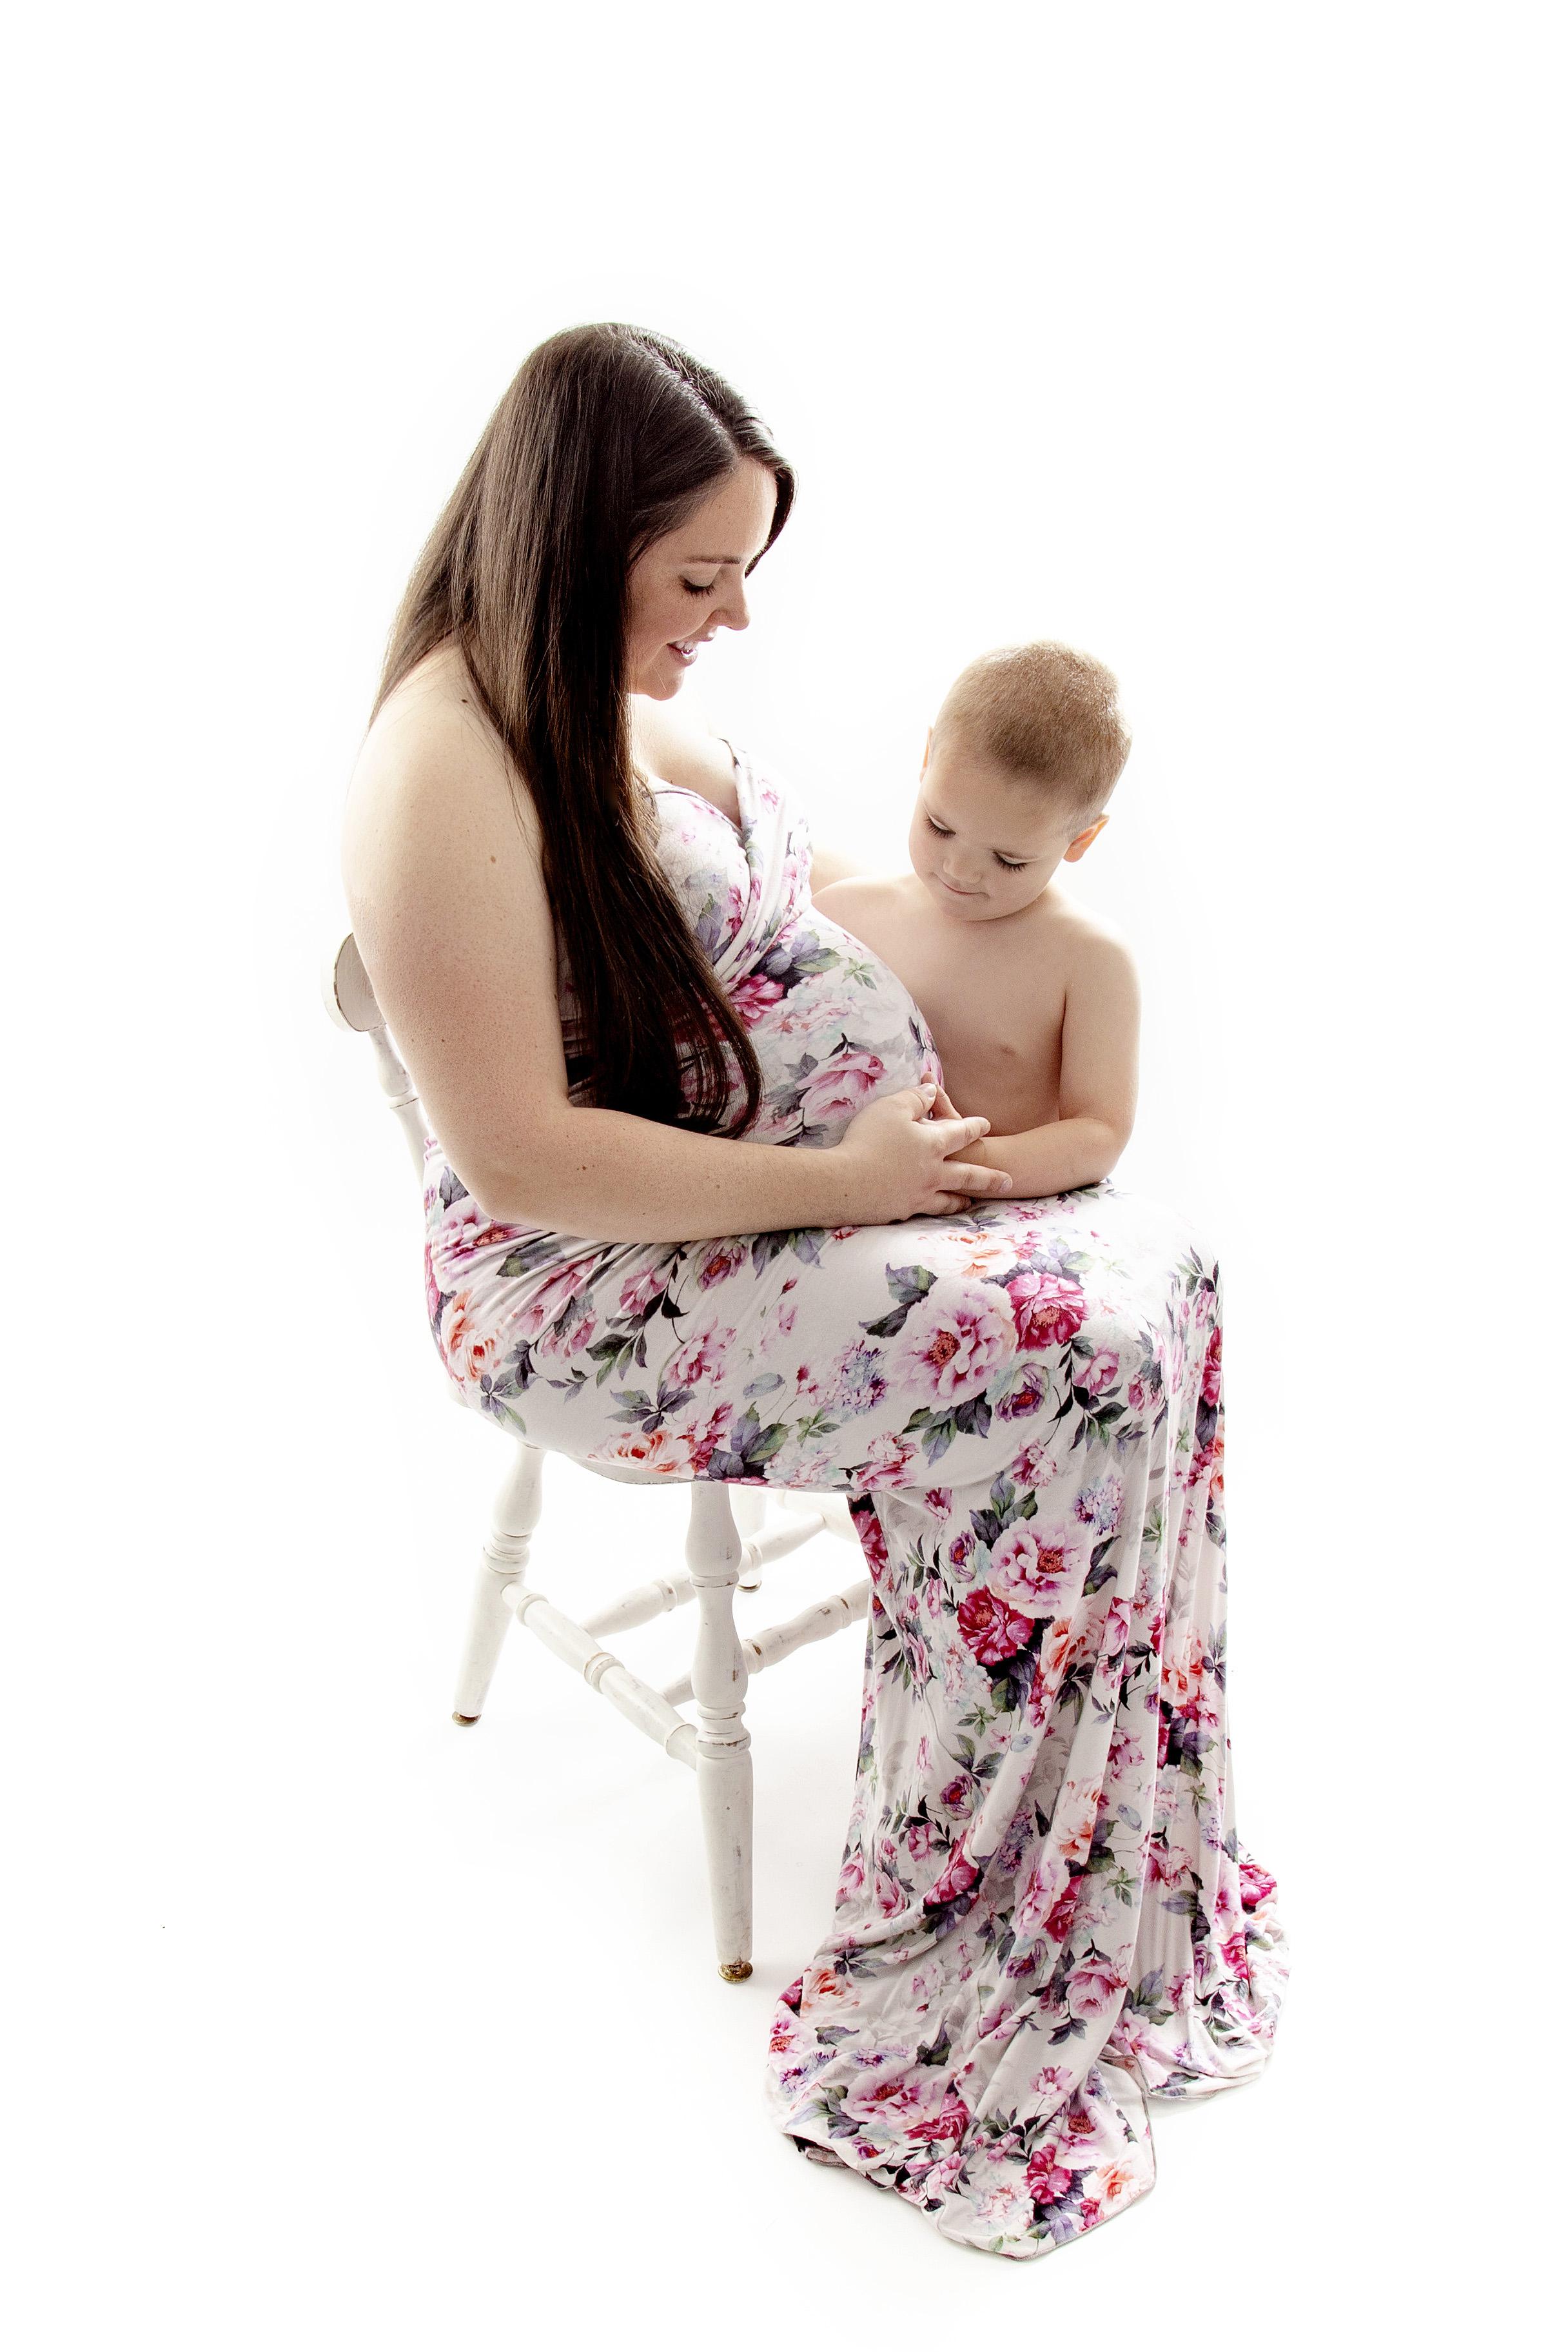 Angie_Englerth_Maternity_003.jpg